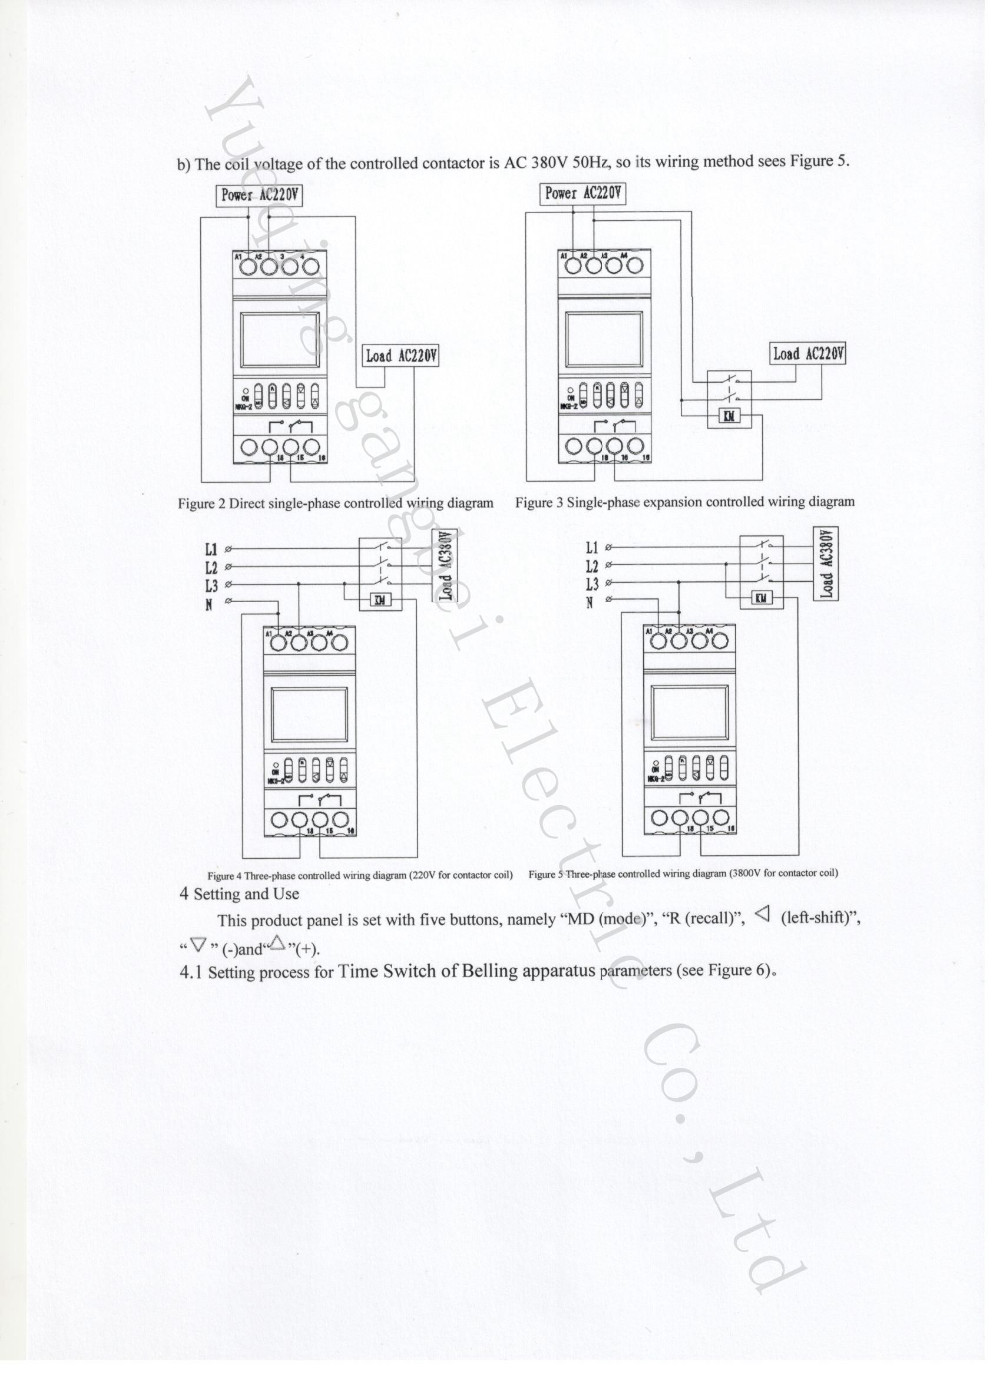 Online Shop Nkg4 Automatic School Bell Controller. Nk44444 Nk444441. Wiring. School Bell Wire Diagram At Scoala.co